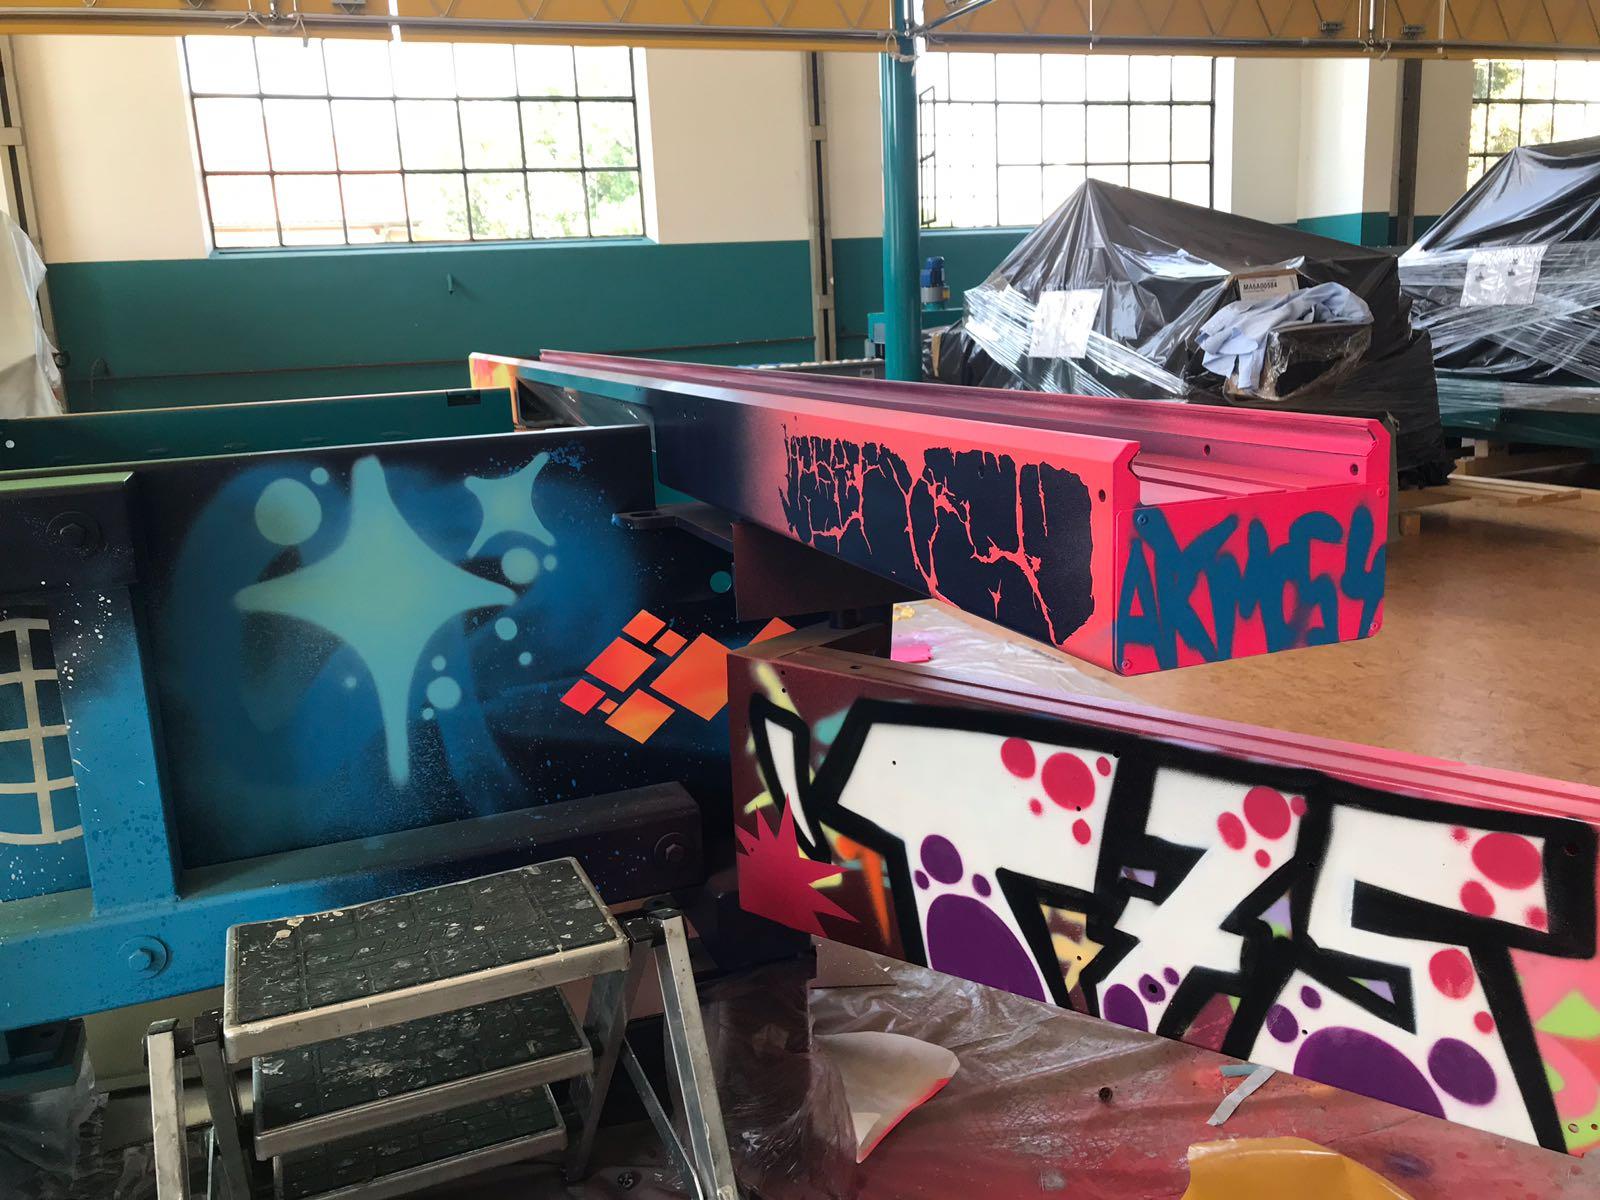 Otto_Martin_GmbH_Formatkreissäge2_artmos4_graffitiauftrag_graffiti_syle_tag_streetart_maschine_9